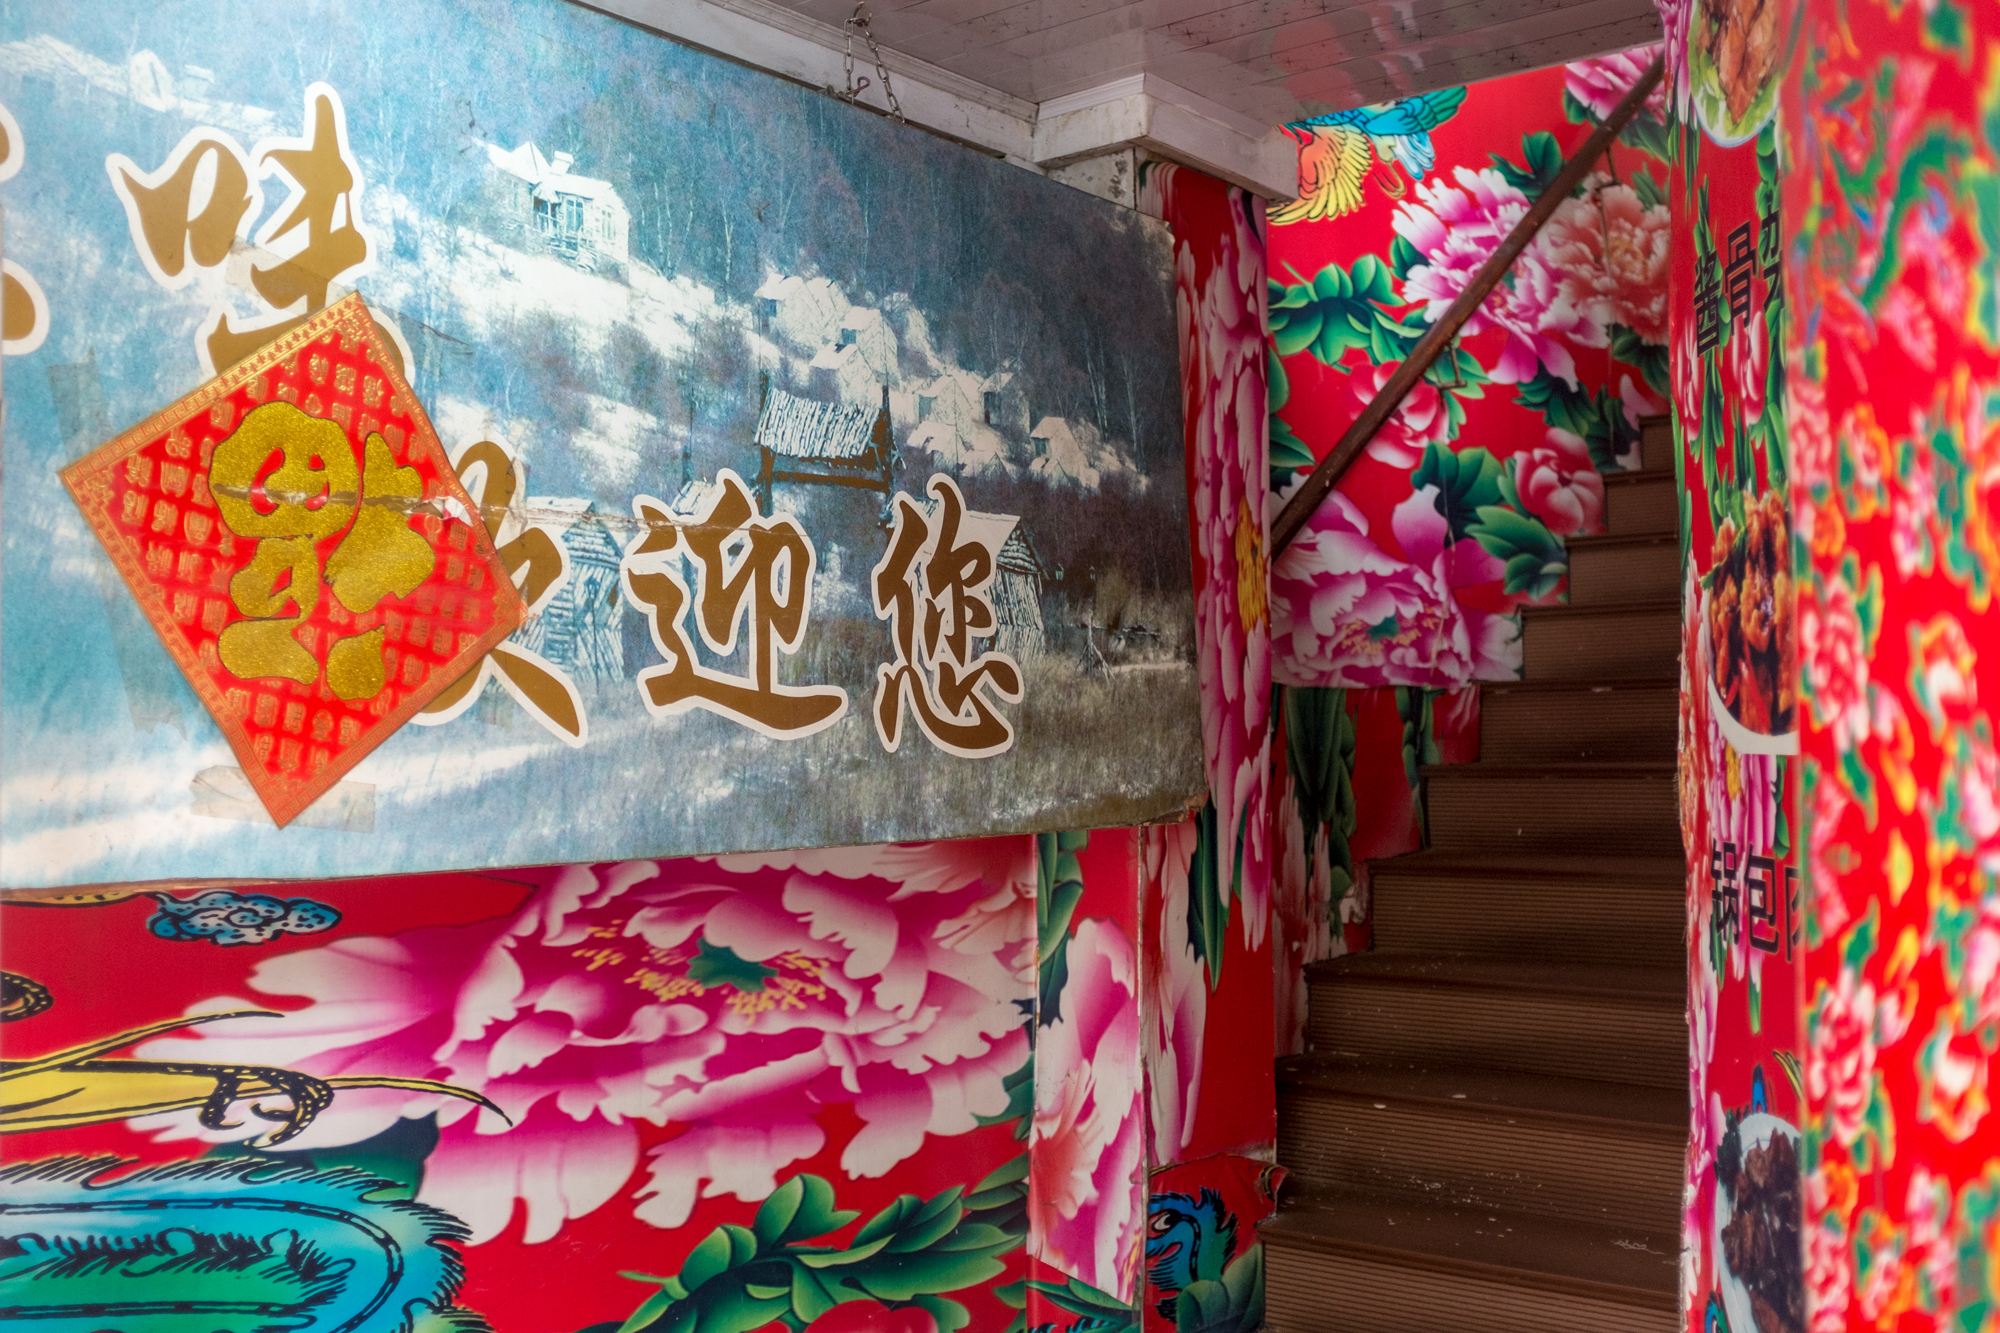 Restaurant Entrance, Guangzhao